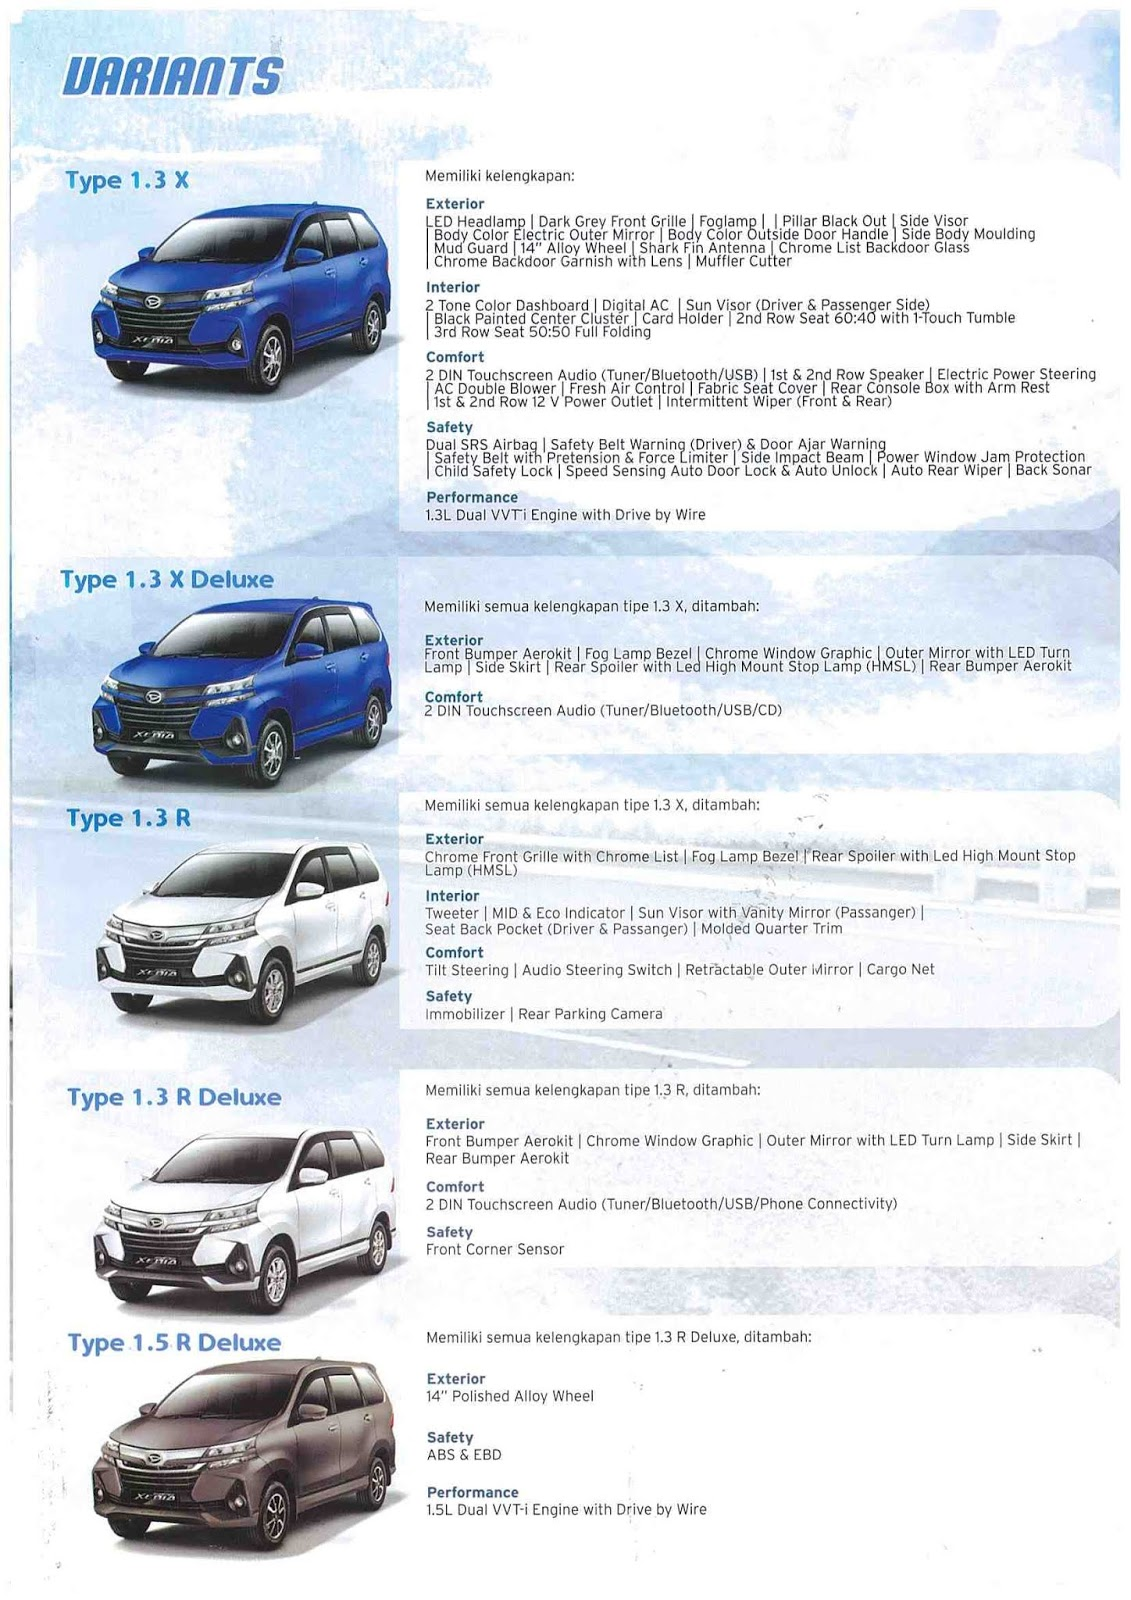 Harga Mobil Daihatsu Xenia Padang 2020 Promo Dp Kredit Ringan